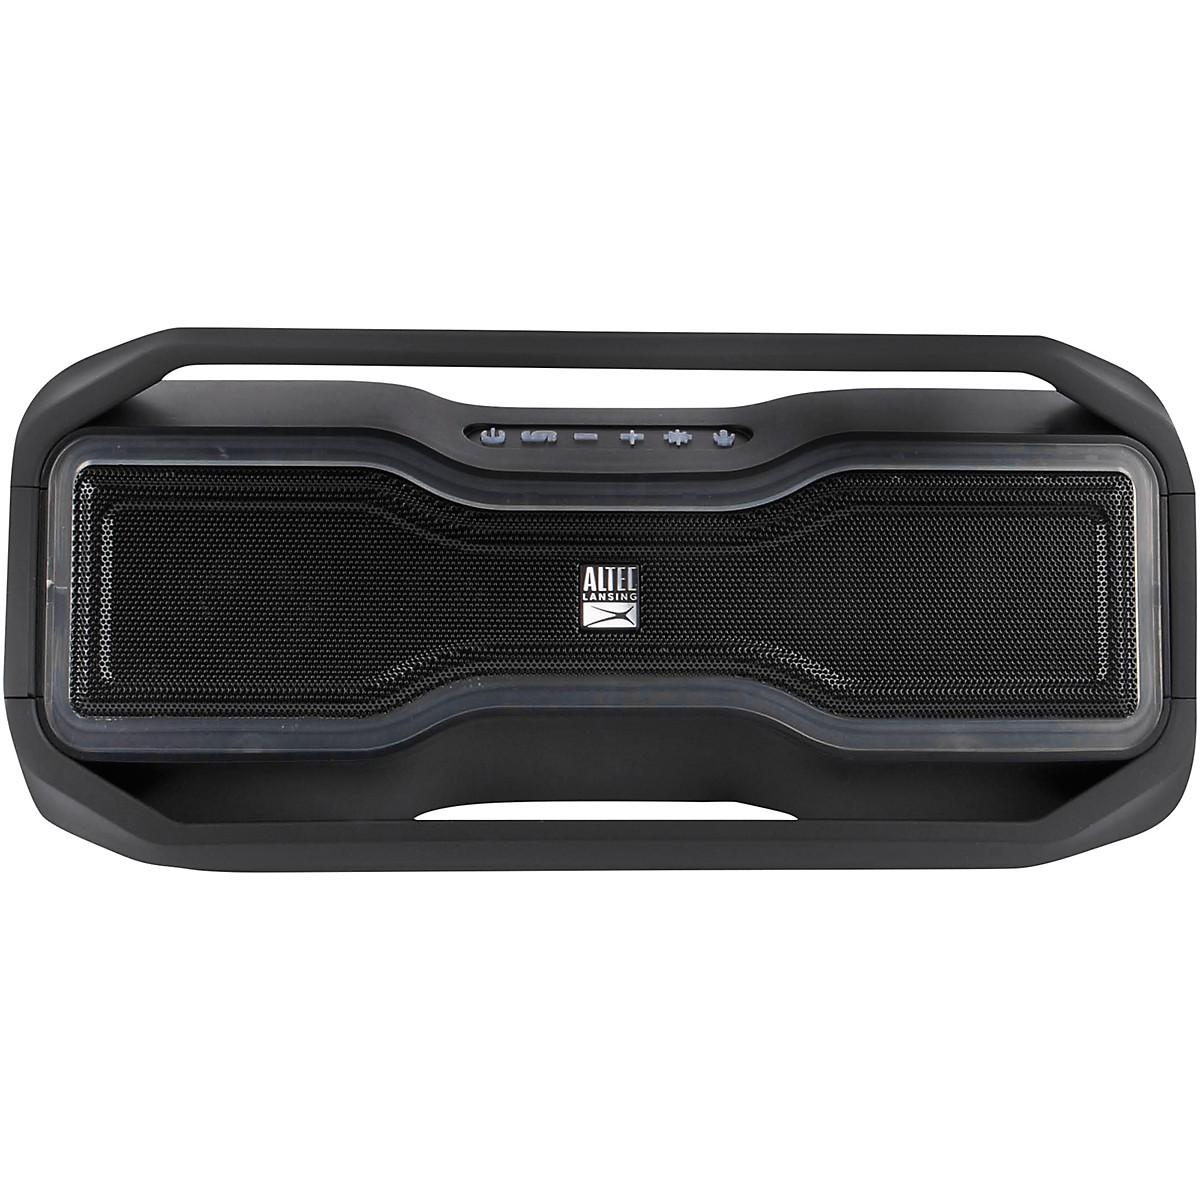 Altec Lansing Rock Box Mini Rugged Bluetooth Speaker